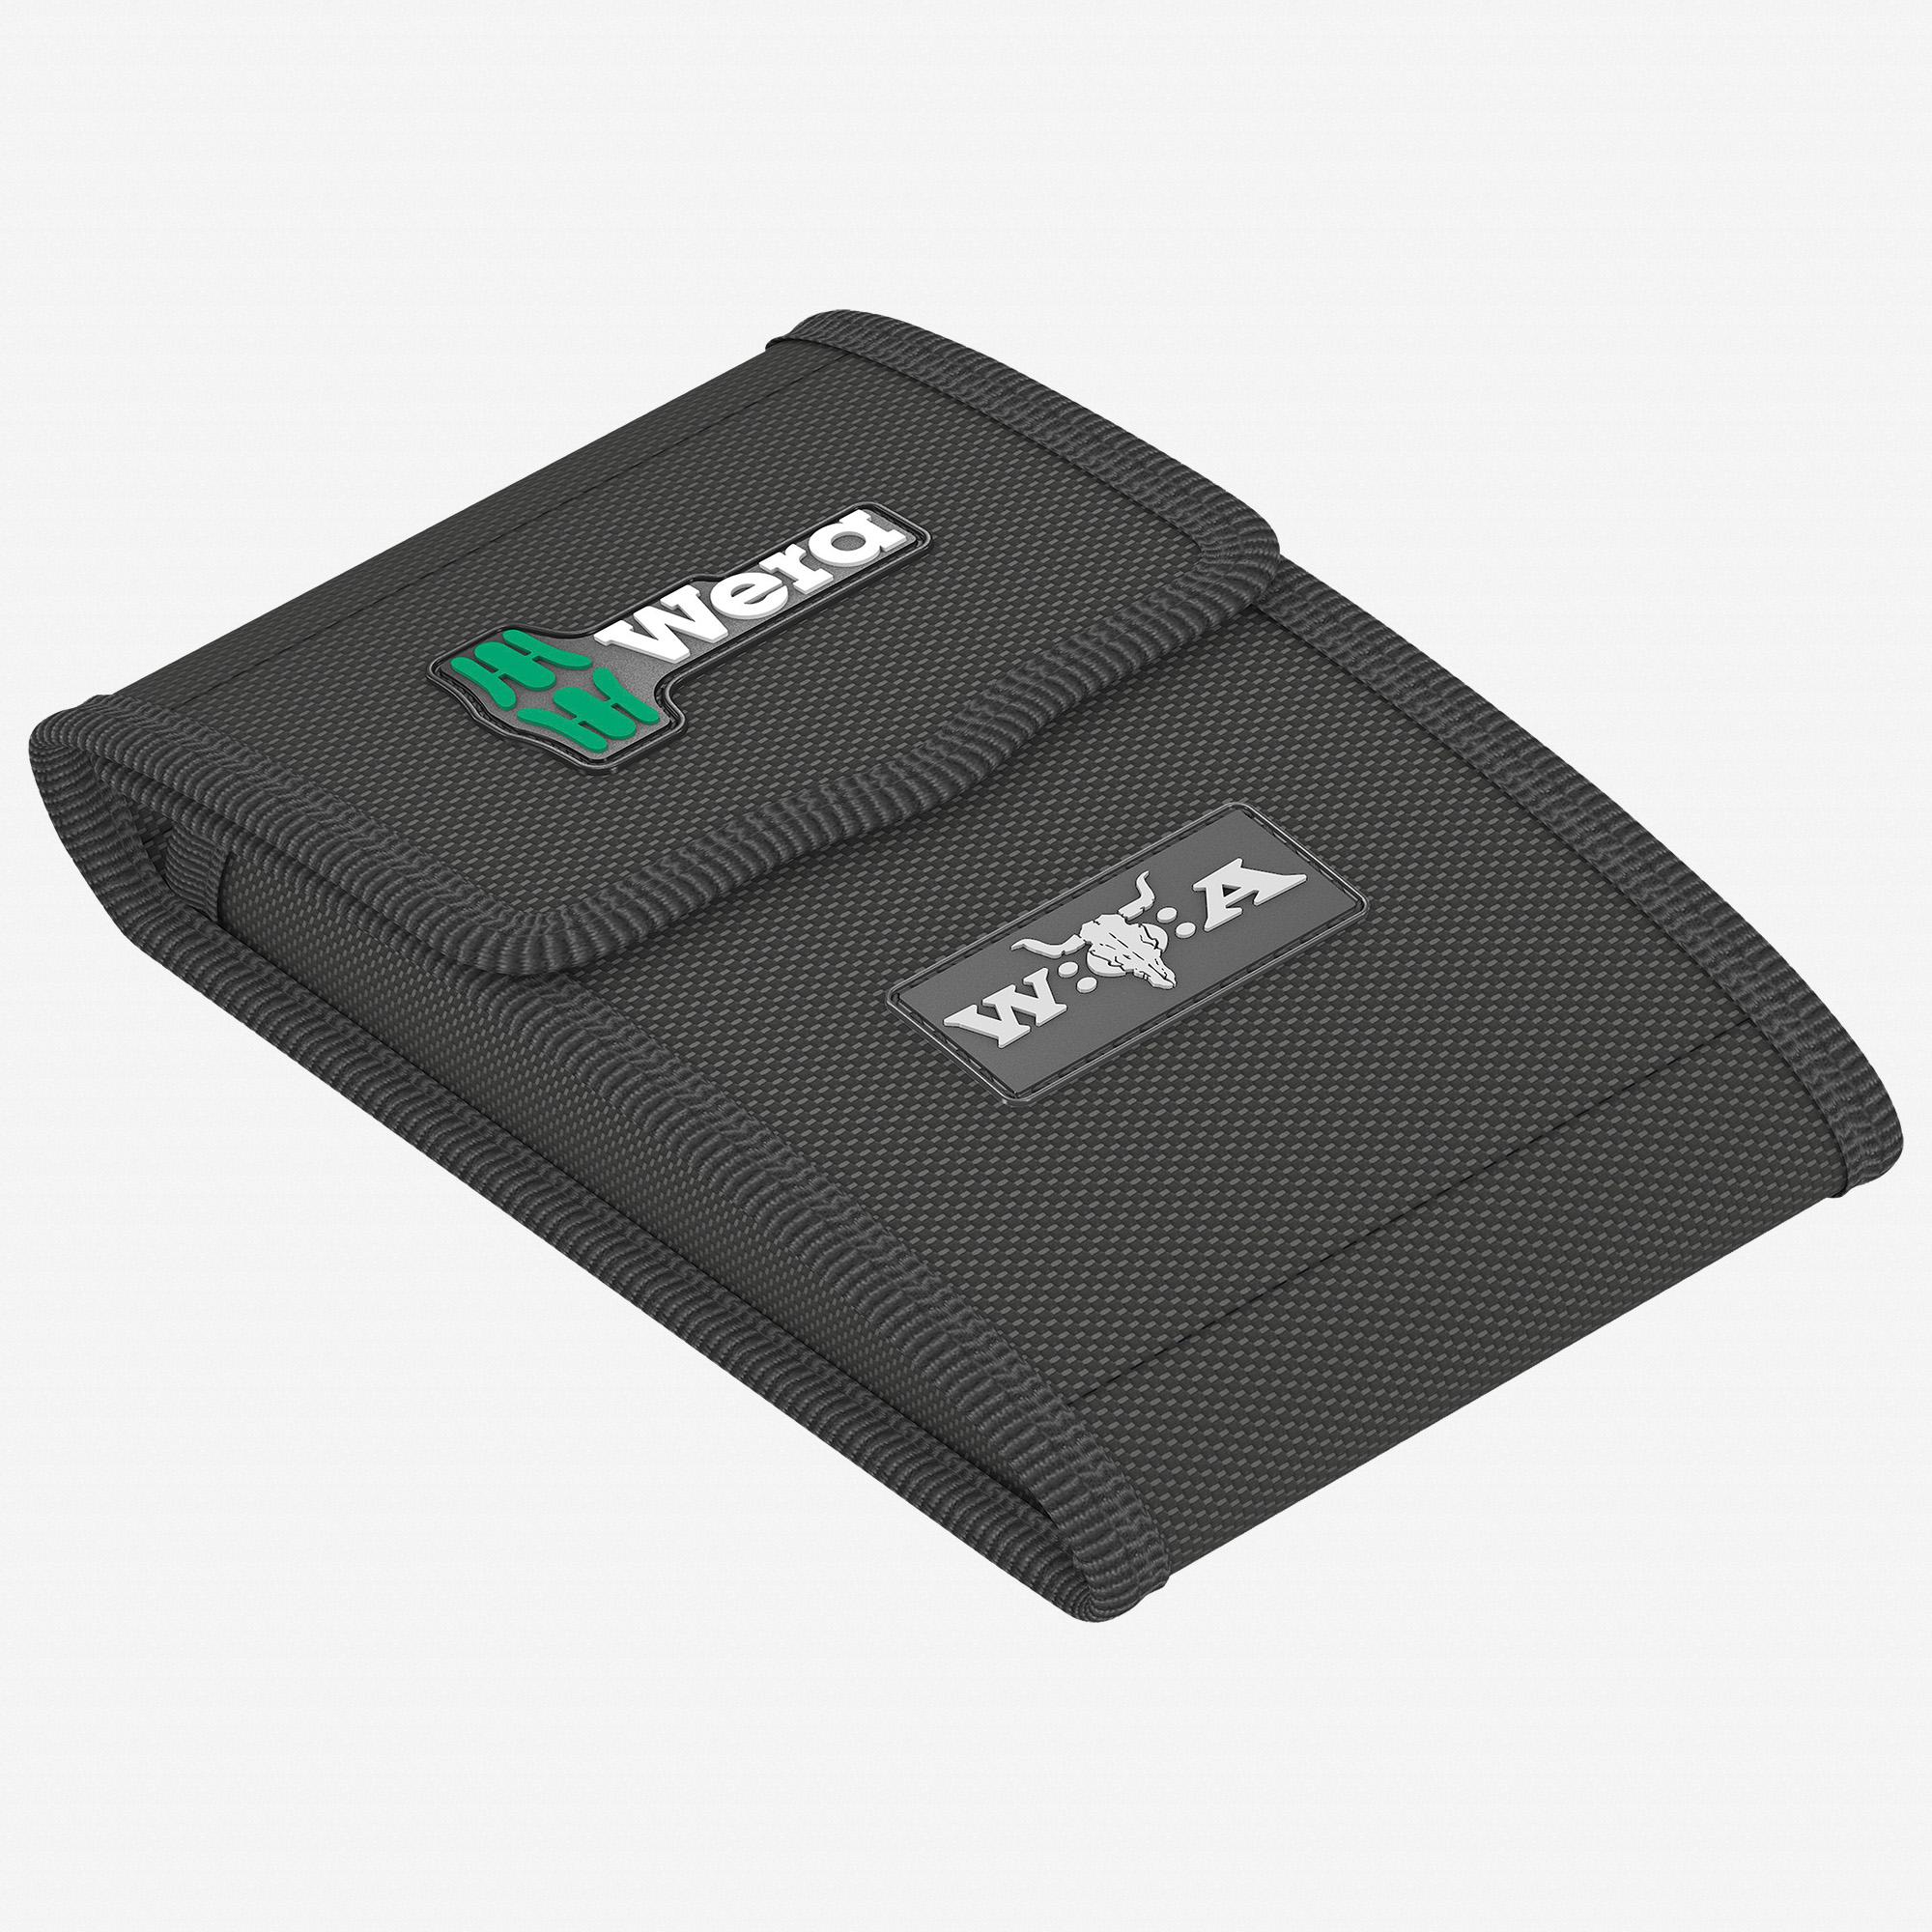 Wera 134004 Wacken Set 1, 17 Pieces - KC Tool